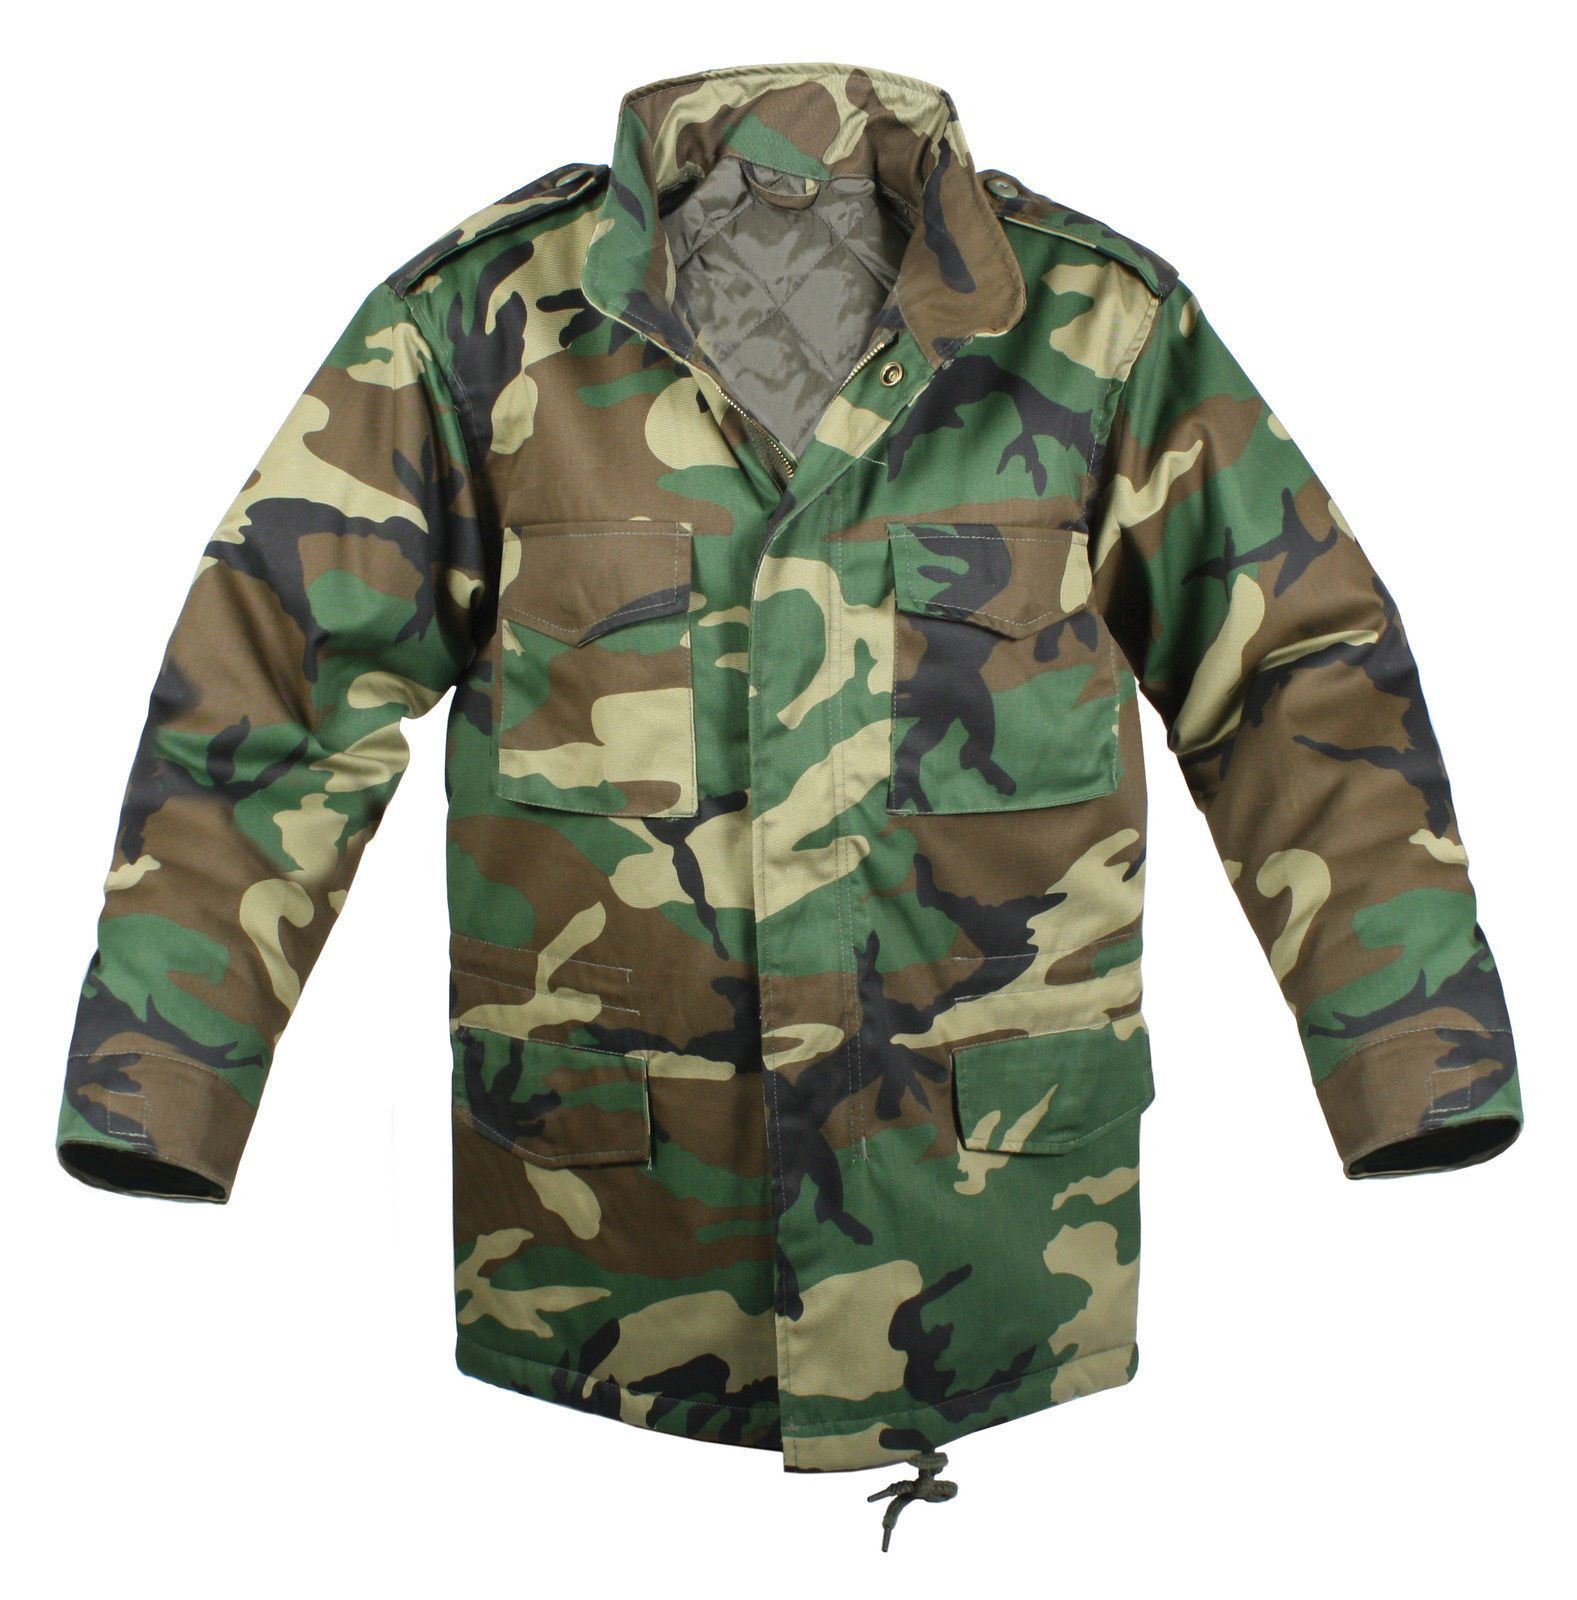 Kids M-65 Field Jacket - Boys Military Jackets - Black Or Wood Camo Winter  Coat 8ea8aac6489